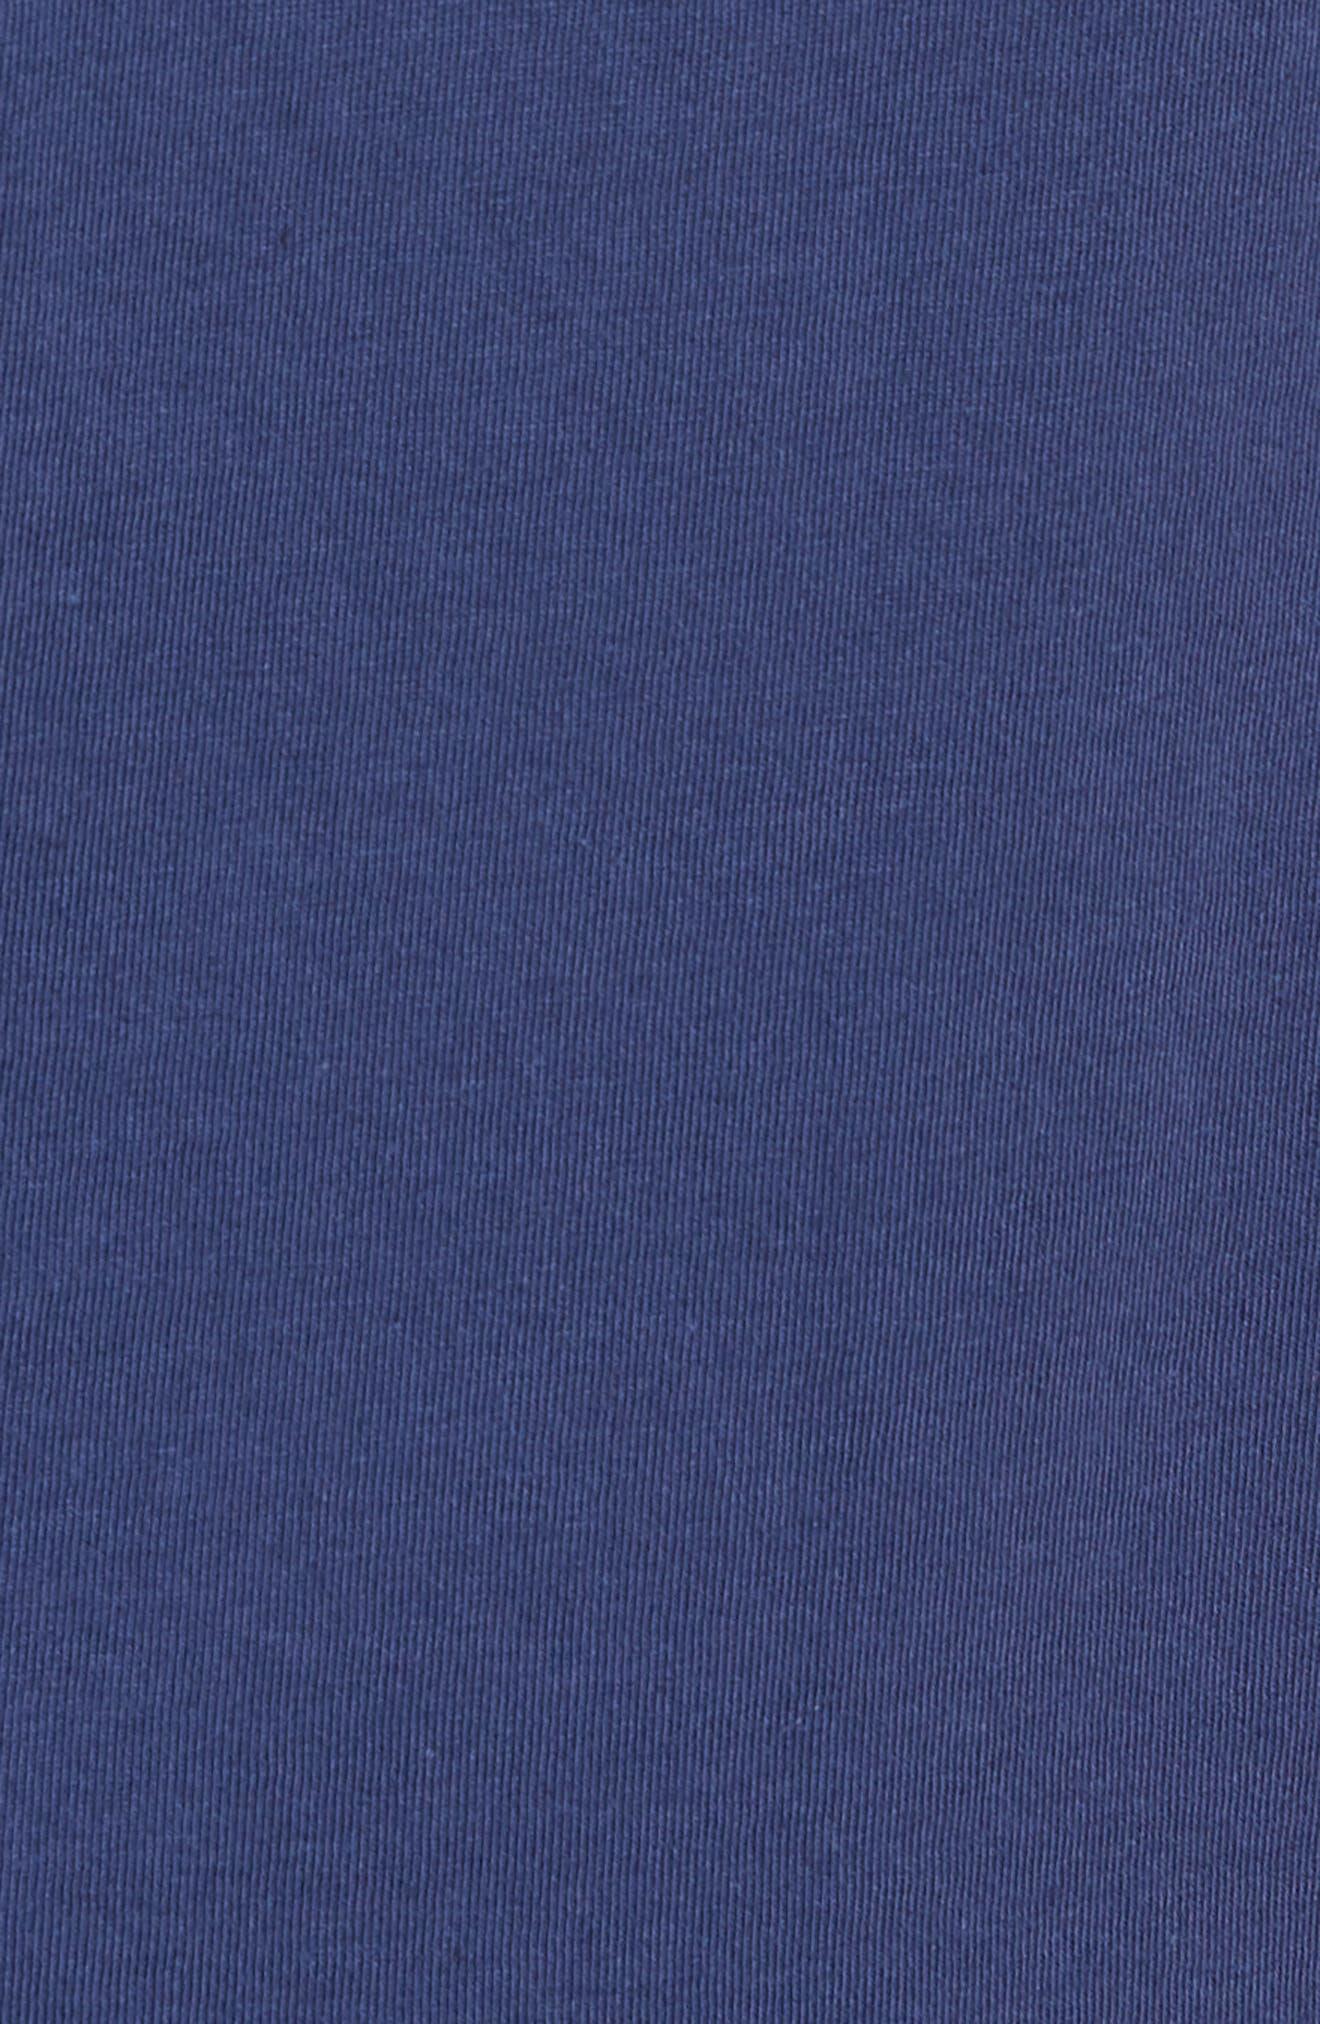 Mercantile Sailboat Graphic T-Shirt,                             Alternate thumbnail 5, color,                             400